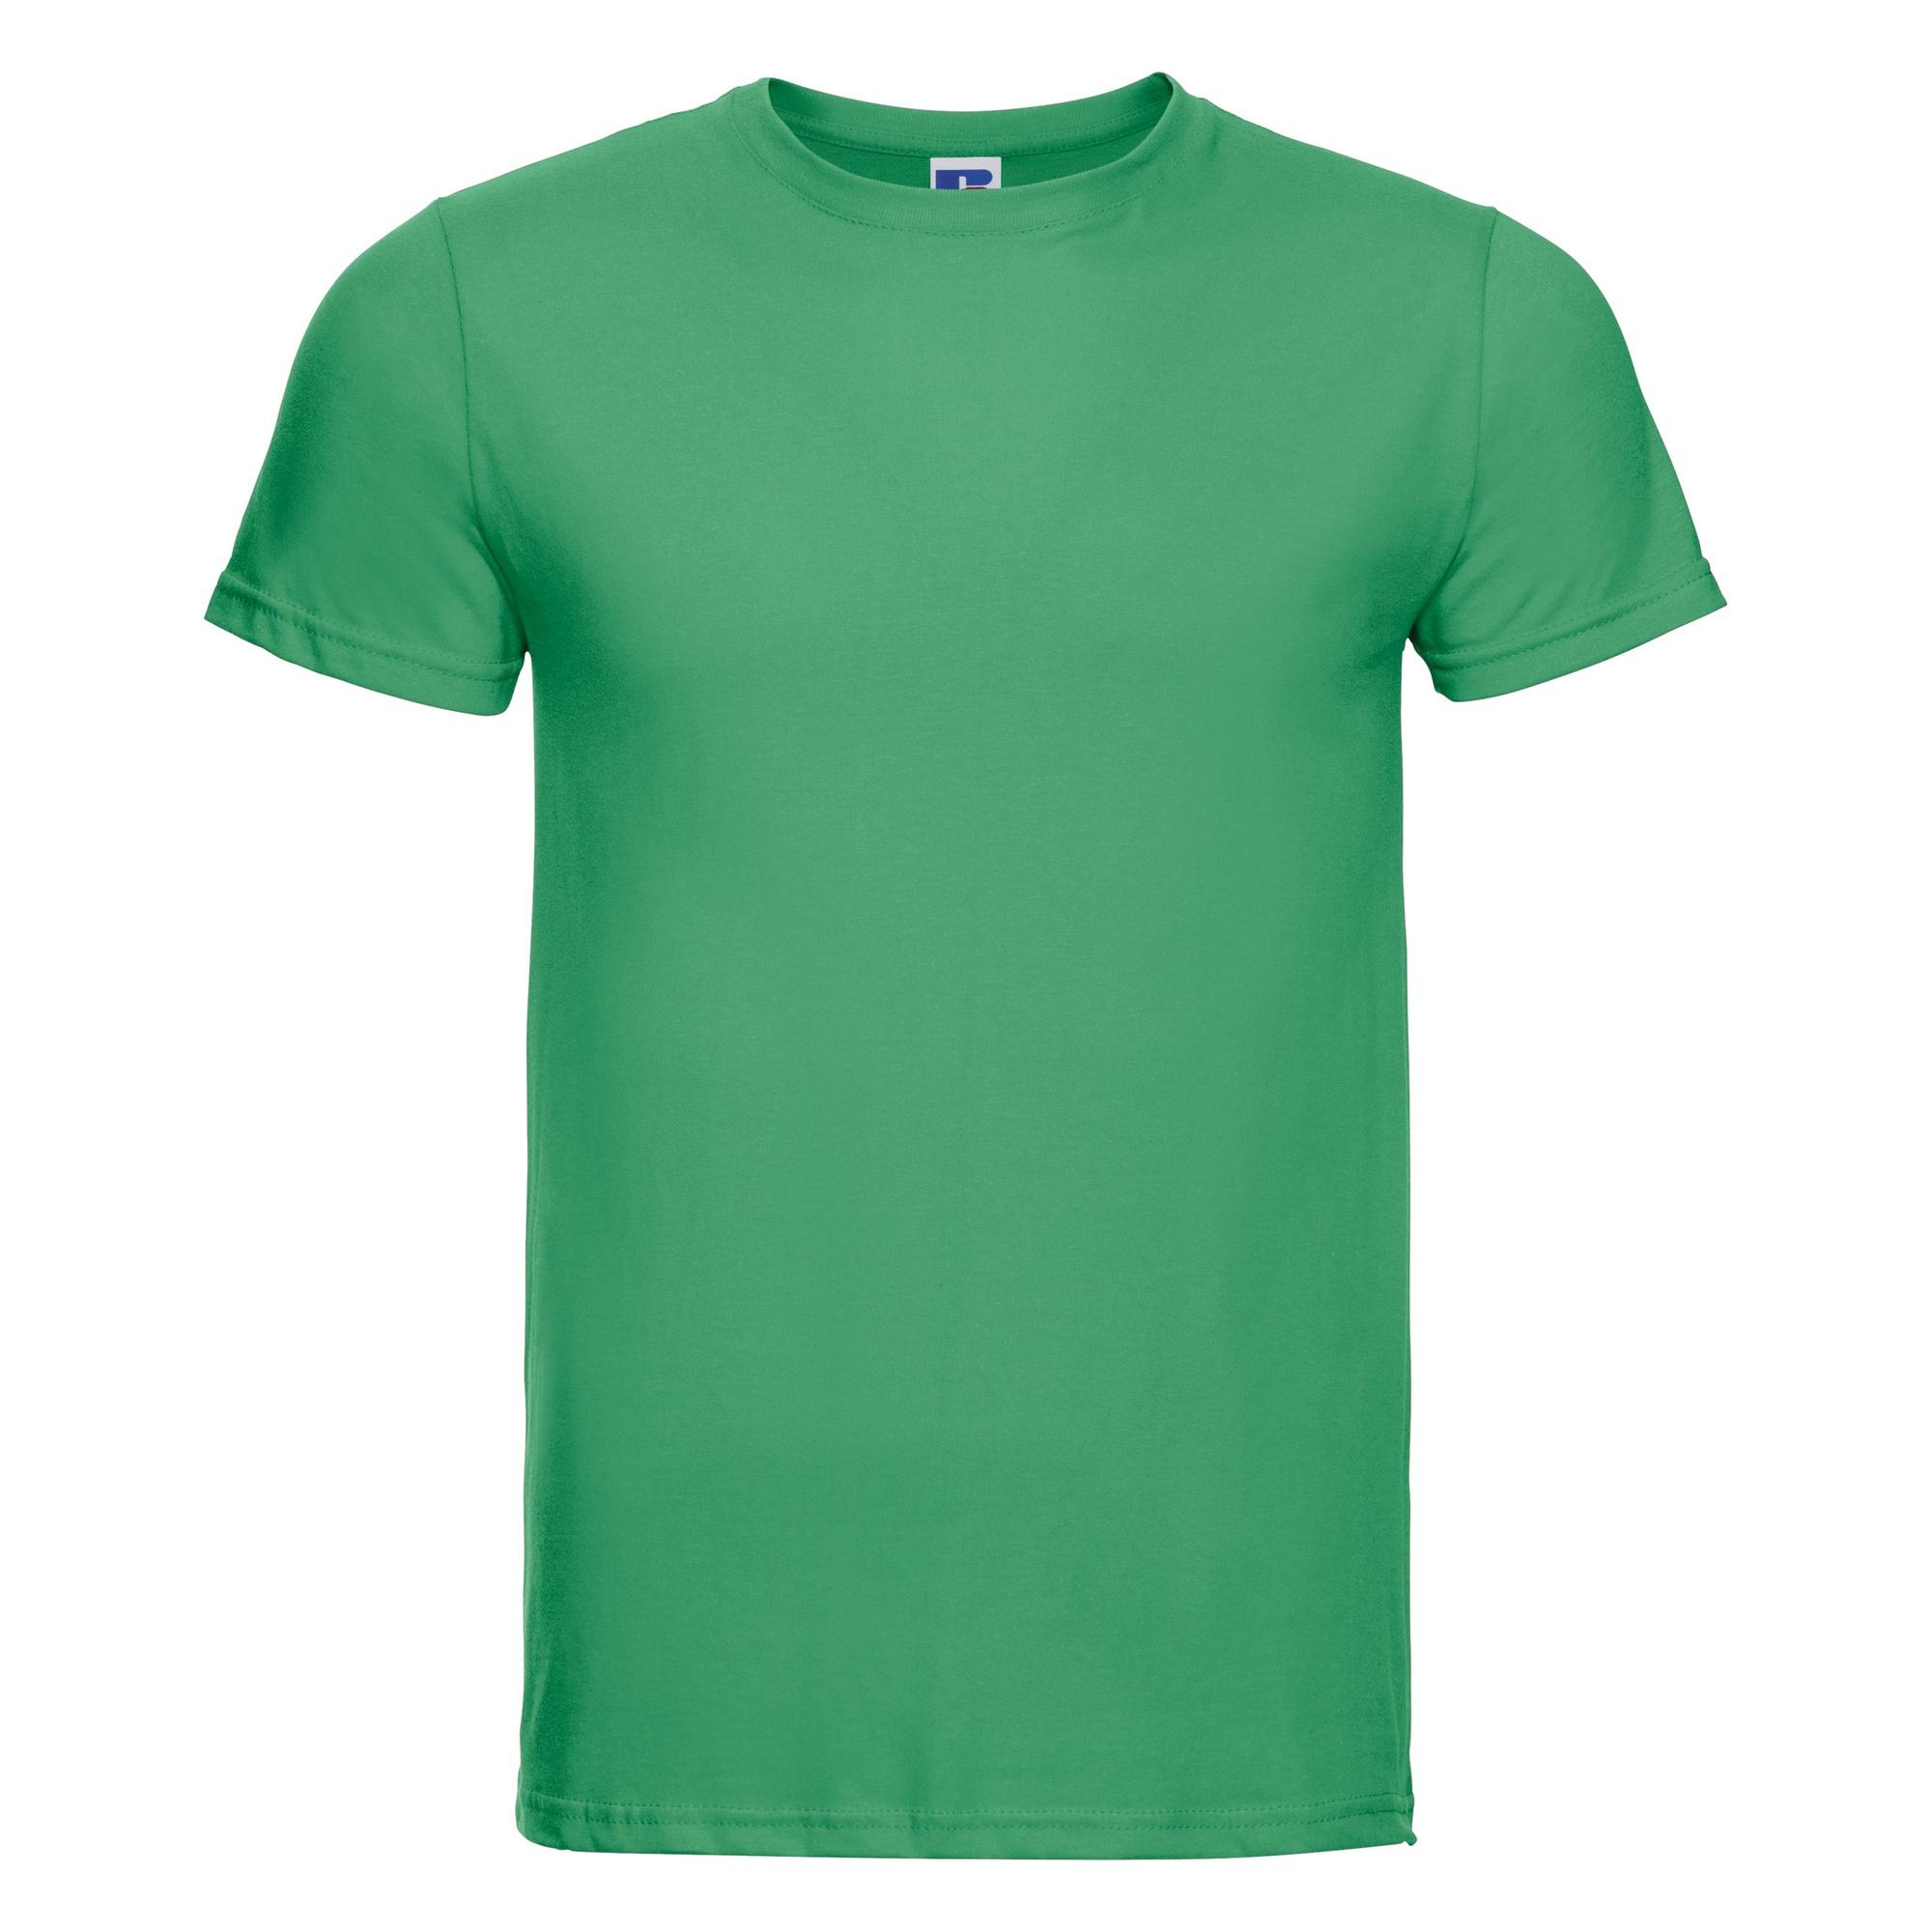 Russell-Mens-Slim-Plain-Blank-100-Cotton-Short-Sleeve-T-Shirt-Tee-BC1515 thumbnail 16